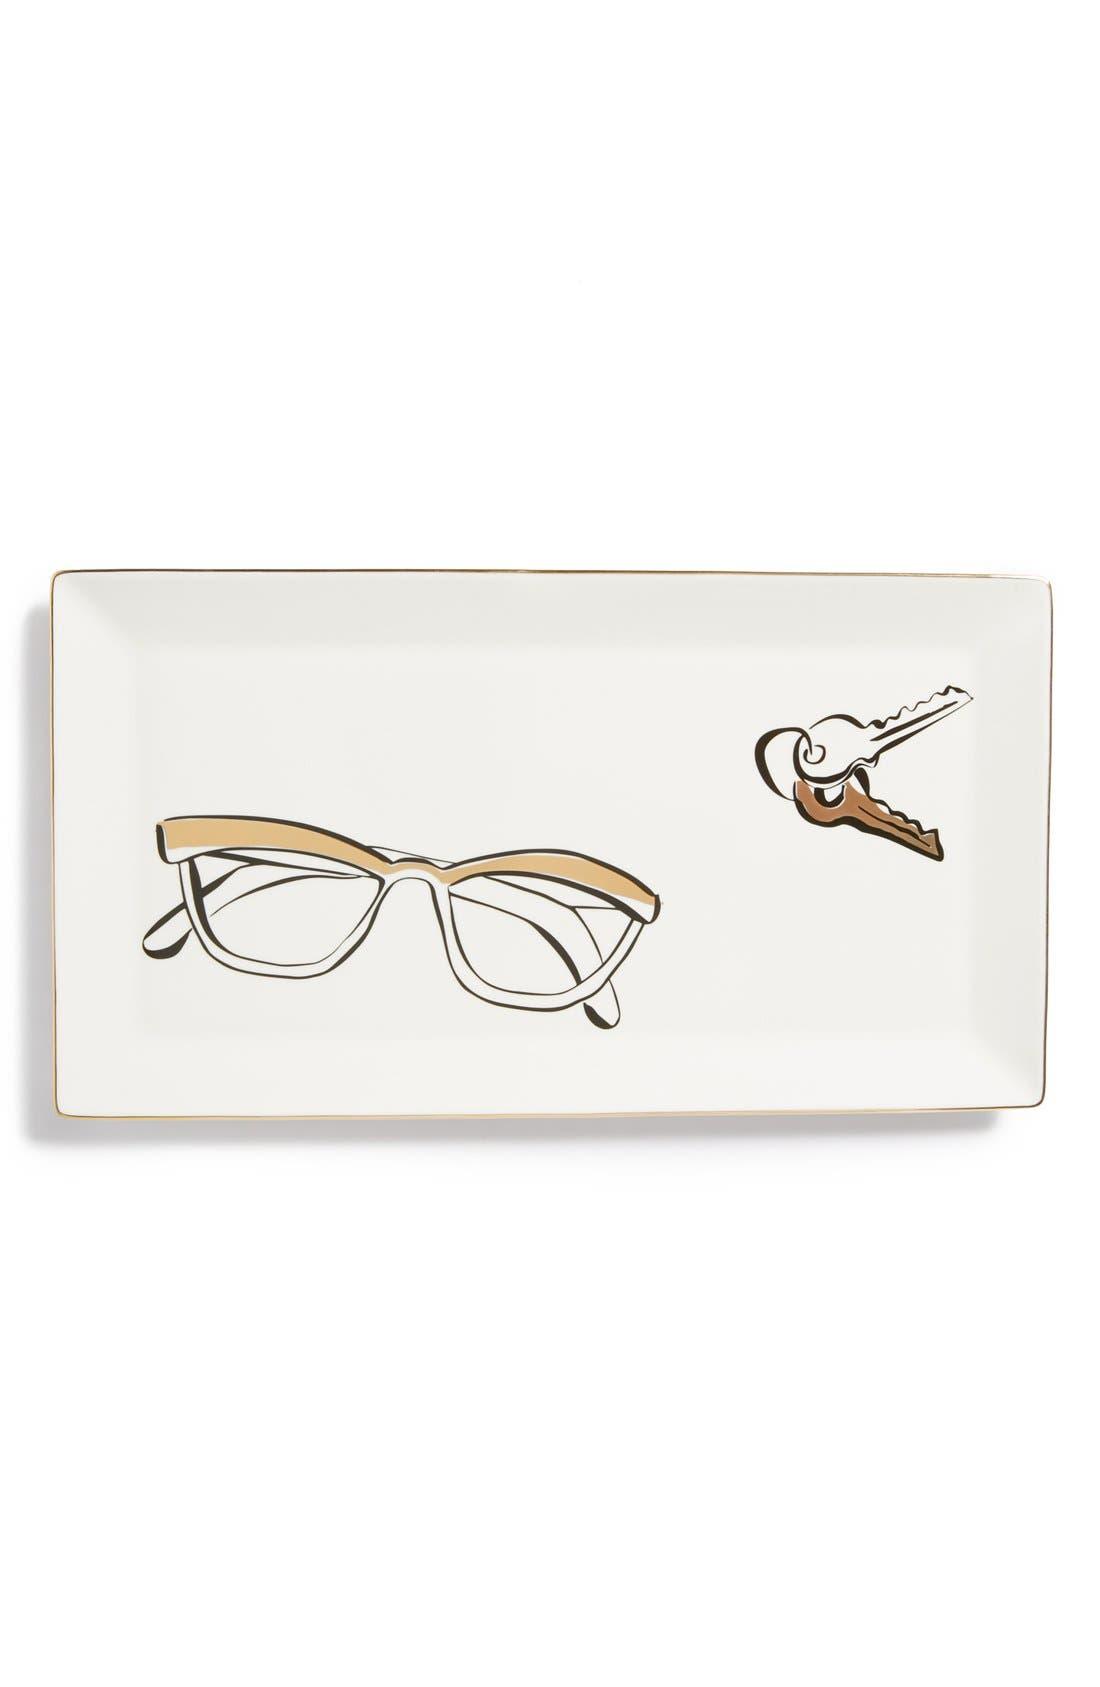 Main Image - kate spade new york 'eyeglasses' trinket tray